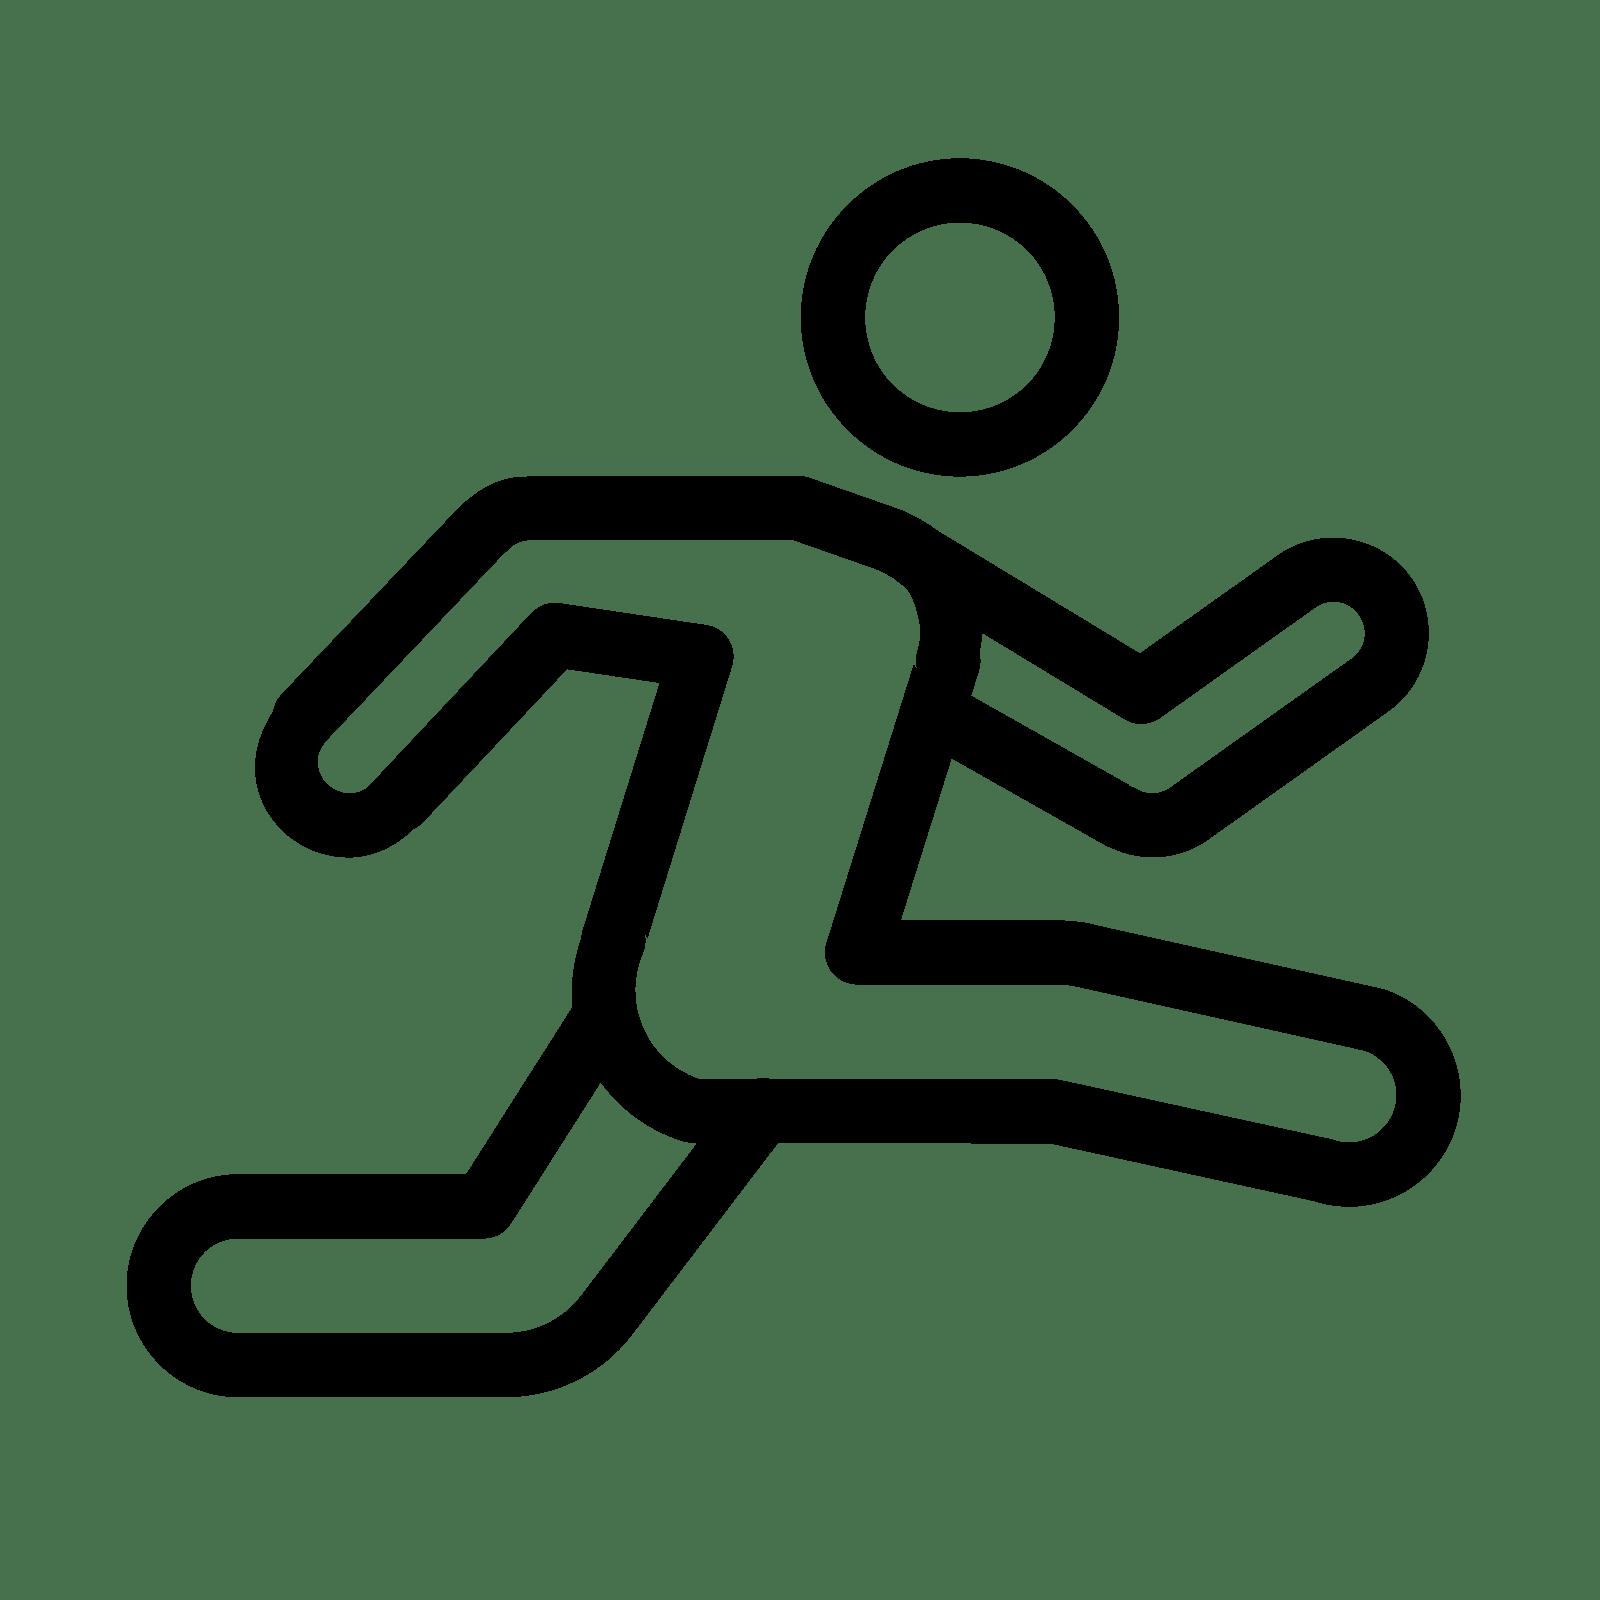 Leichtathletik Icon. PNG 50 px - PNG Leichtathletik